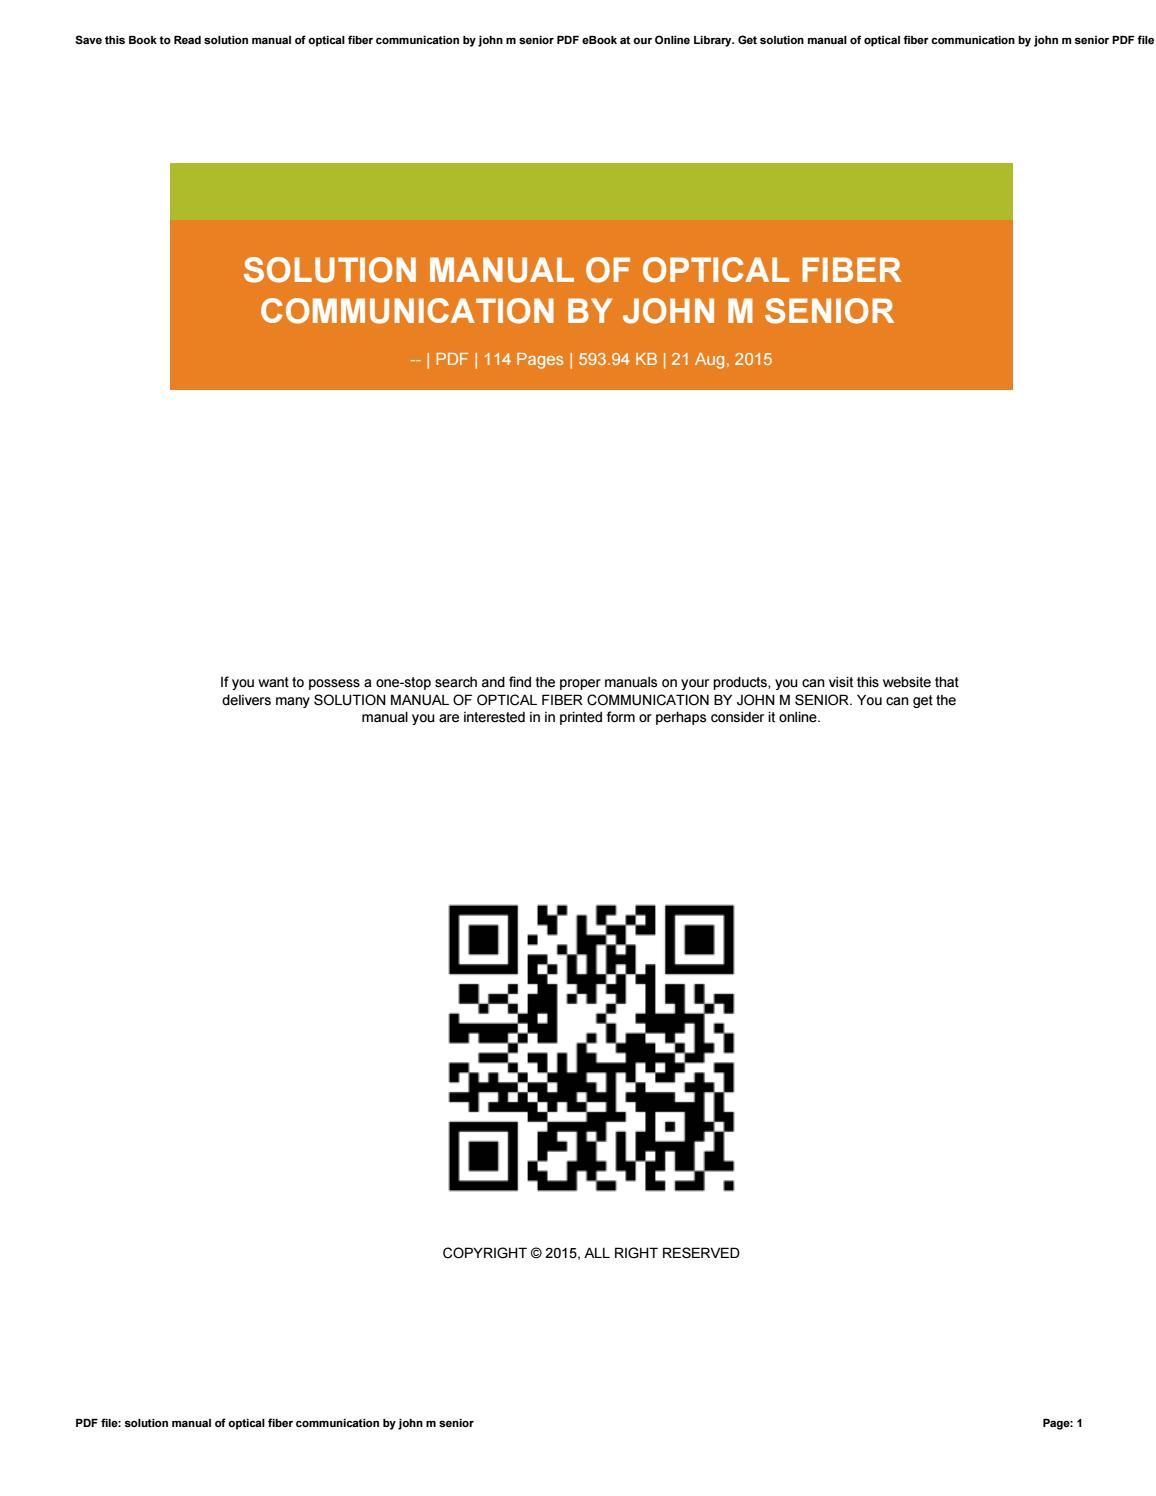 Solution Manual Of Optical Fiber Communication By John M Senior By